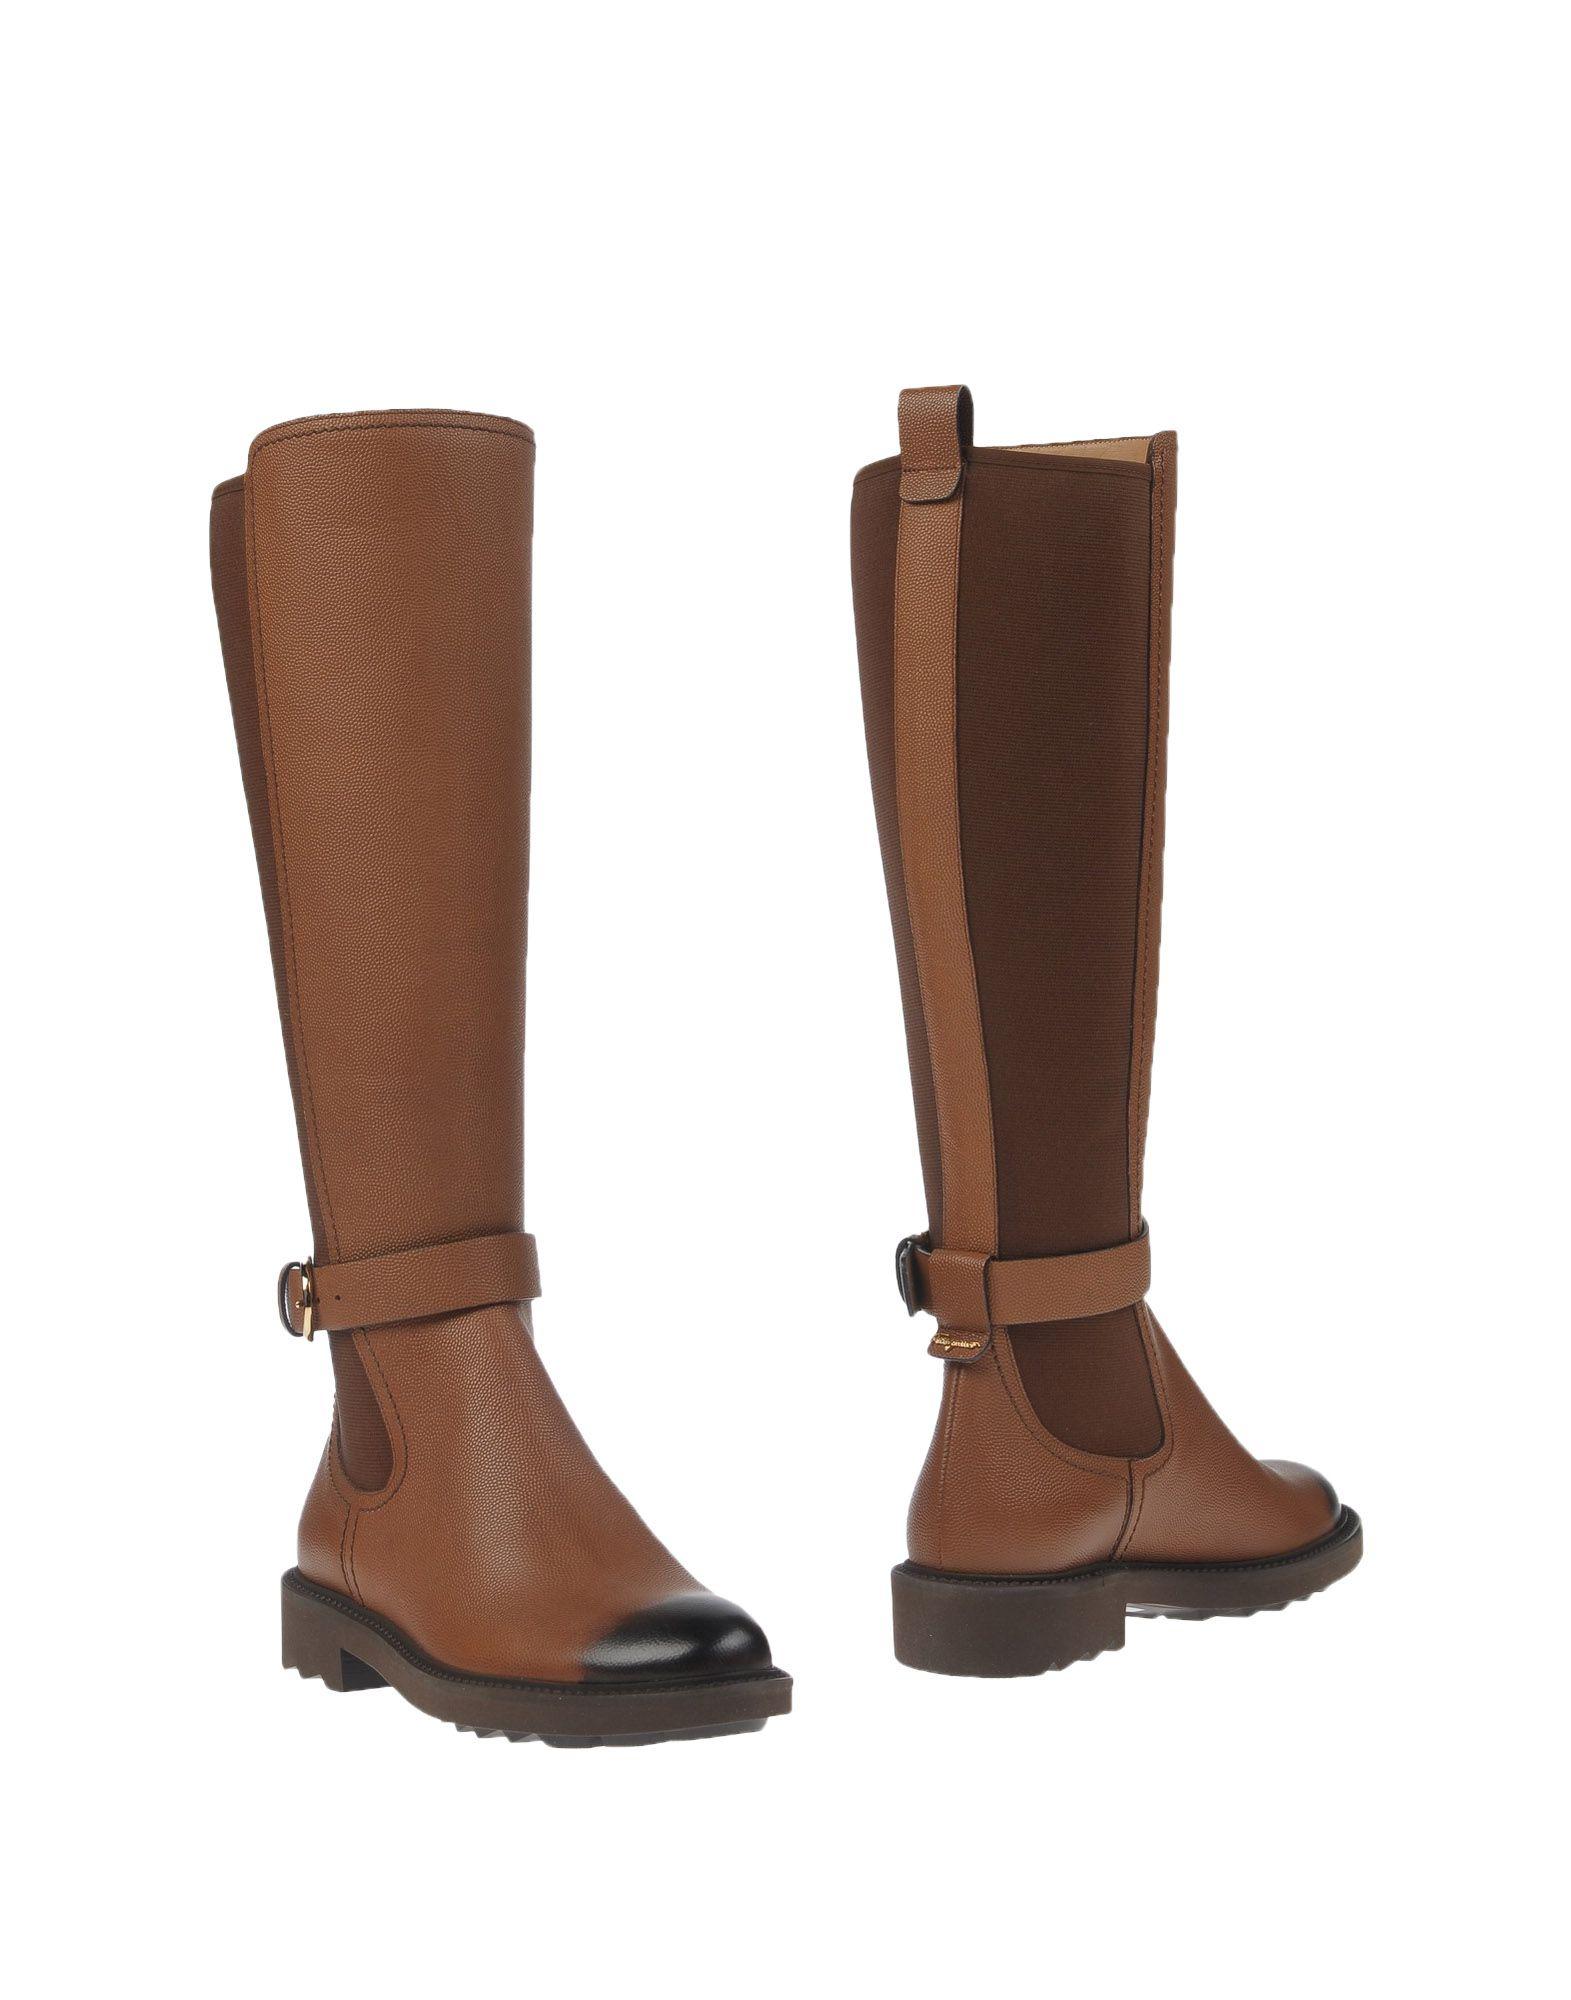 Salvatore Ferragamo Boots - Women on Salvatore Ferragamo Boots online on Women  United Kingdom - 11277224EC 00b33b